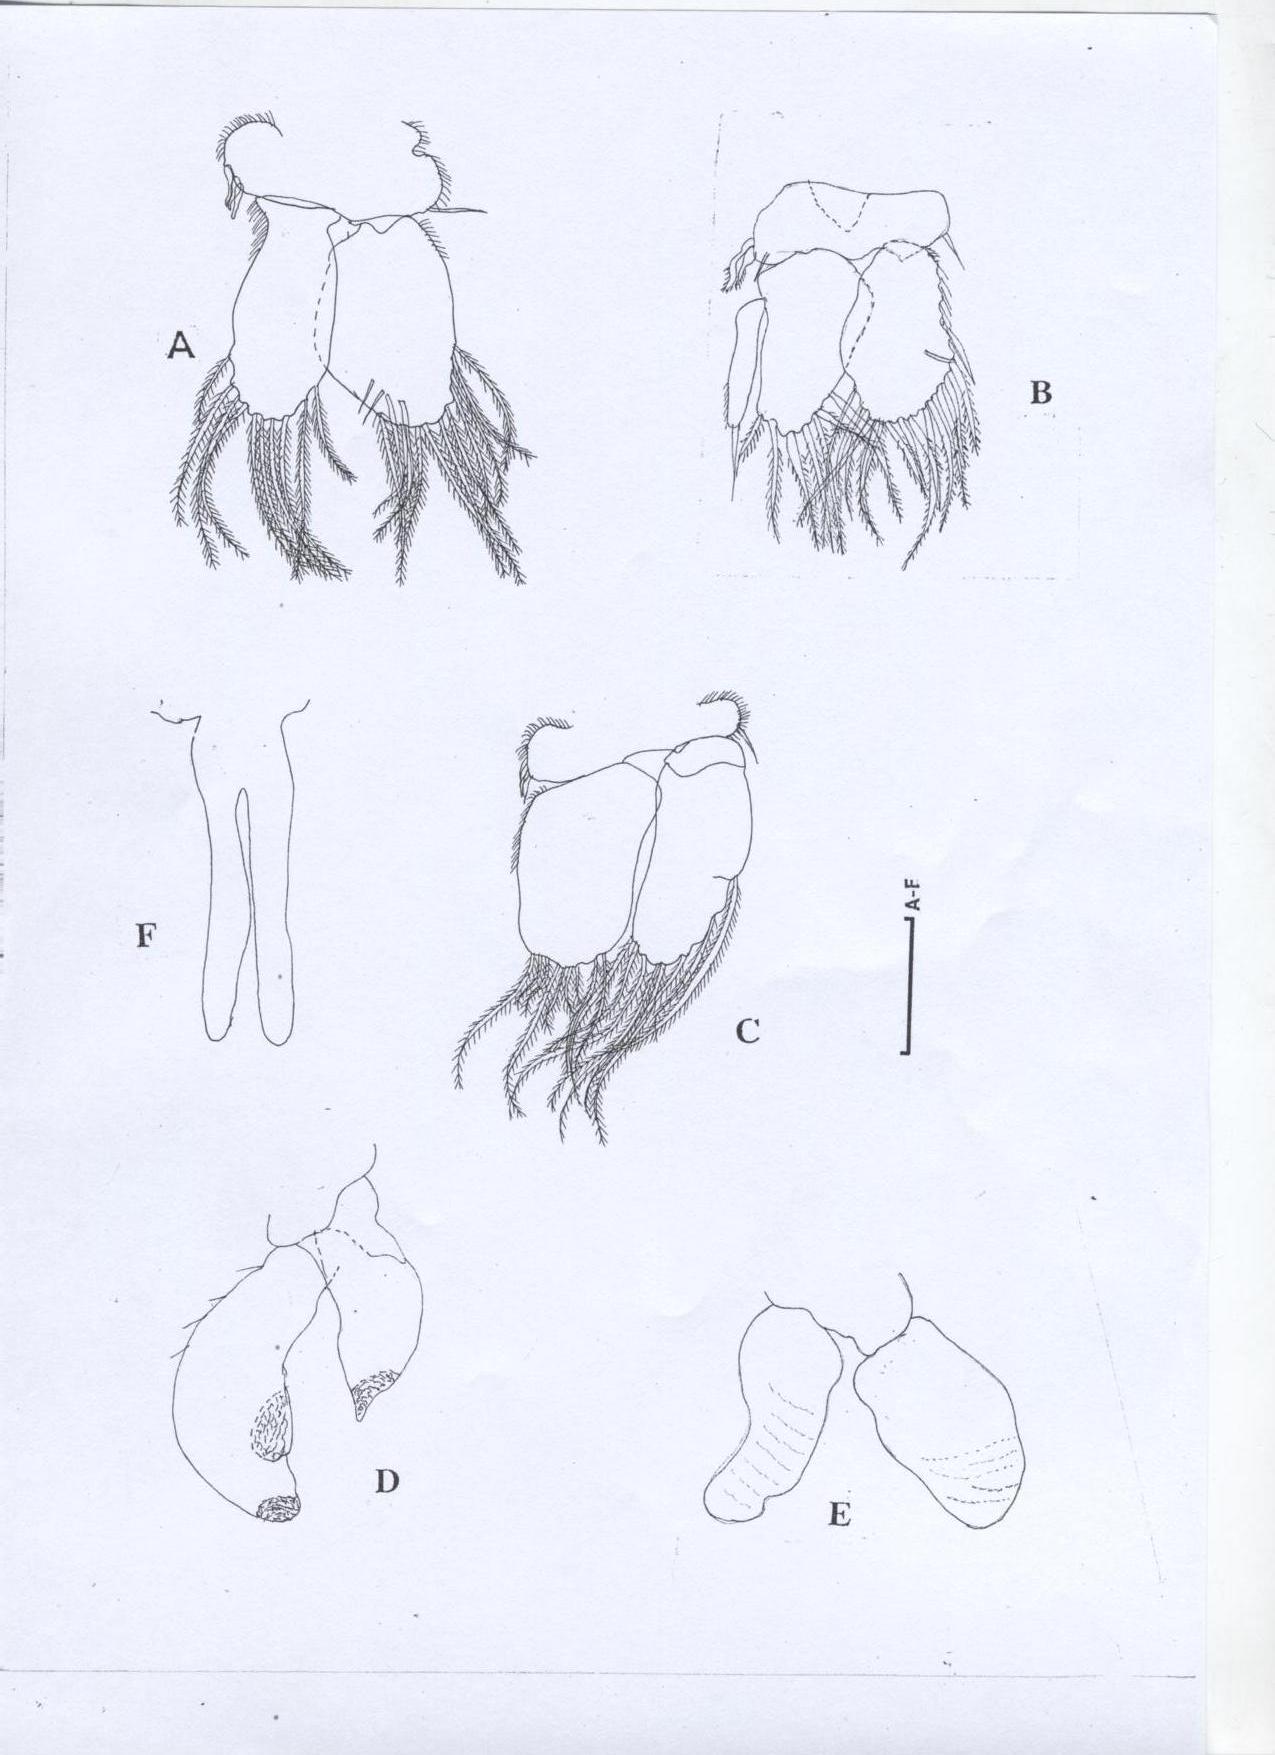 Heterodina qeshmensis Khalaji & Bruce, 2014 [6], A, Pleopod 1; B, Pleopod 2; C, Pleopod 3; D, Pleopod 4; E, Pleopod 5; F, Penial process